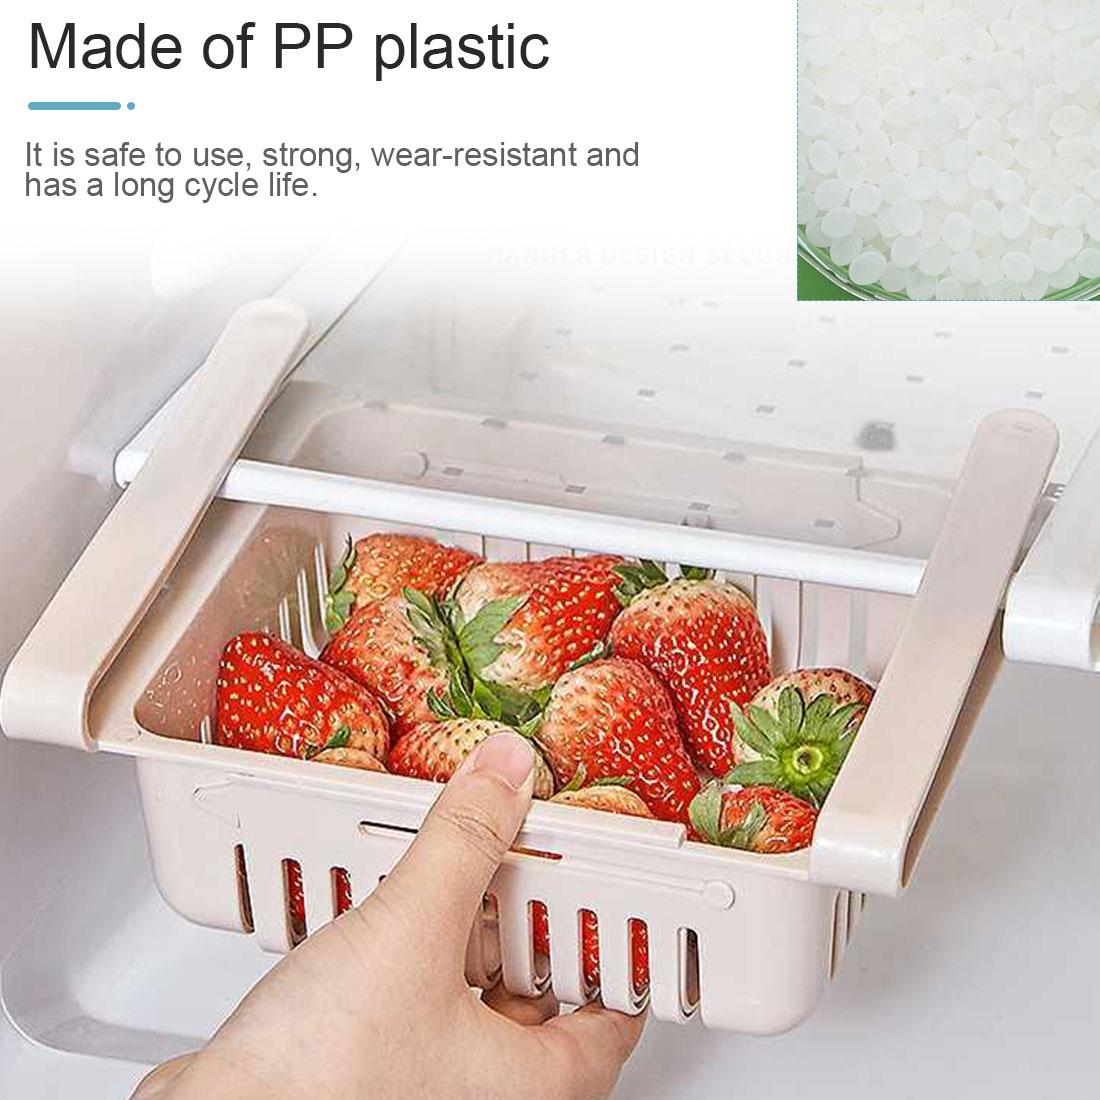 2Pcs Kitchen Accessories Storage Container Refrigerator Organizer Adjustable Plastic Fridge Storage Baskets Pull-out Drawers